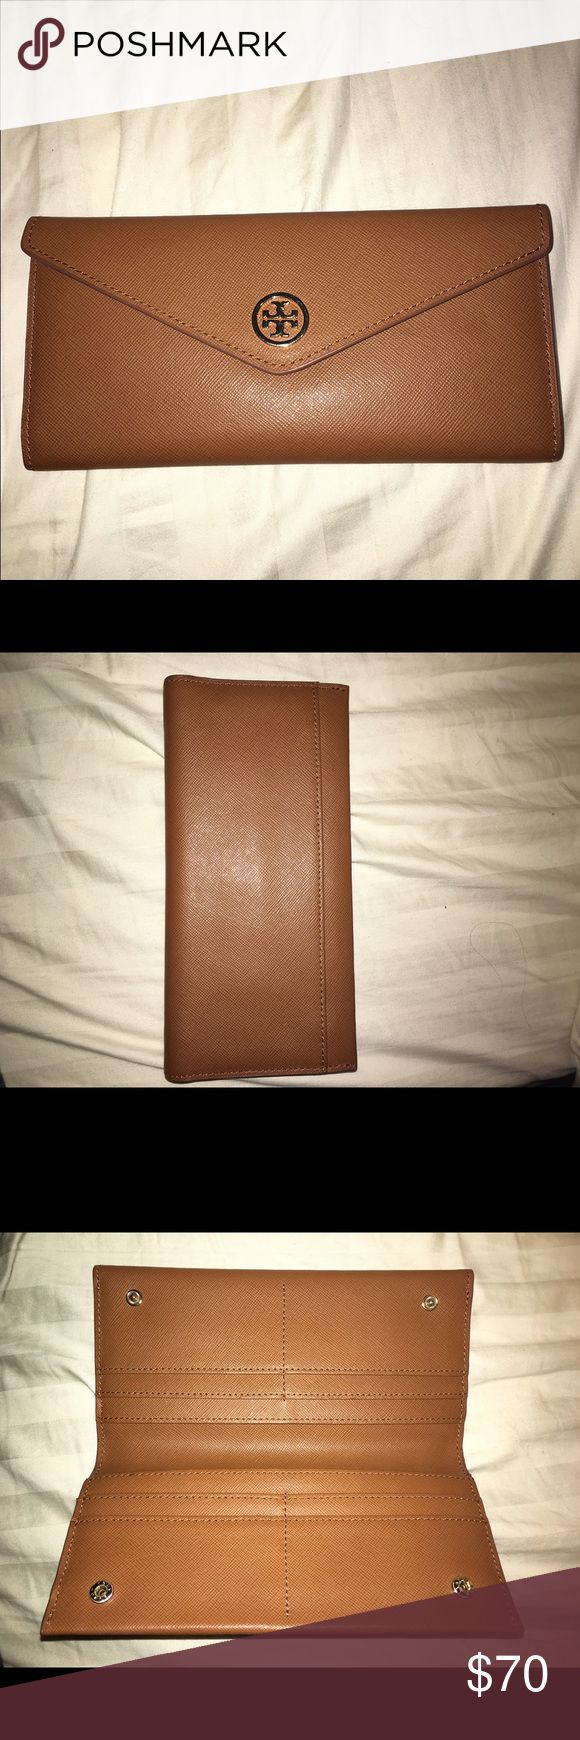 Tory Butch Wallet *Brand New* Tory Burch Brown Wallet Tory Burch Bags Wallets